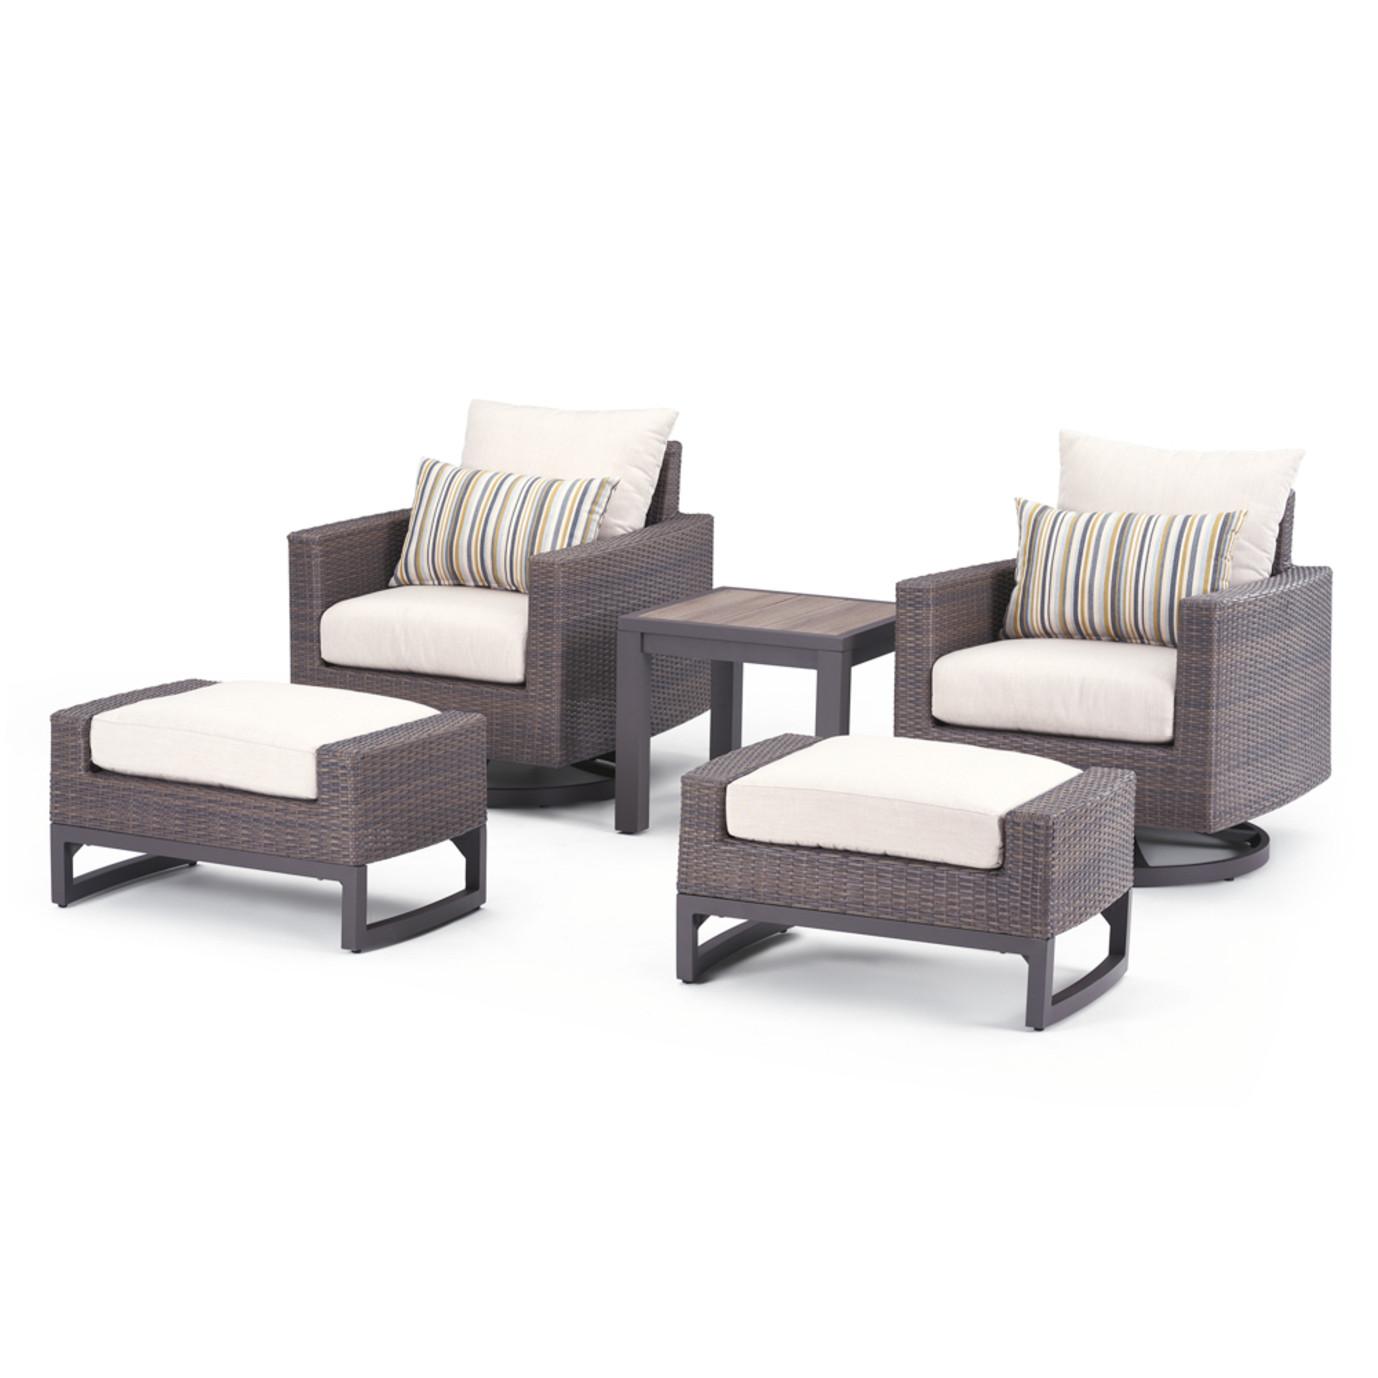 Milea 5 Piece Club Seating Set - Natural Beige